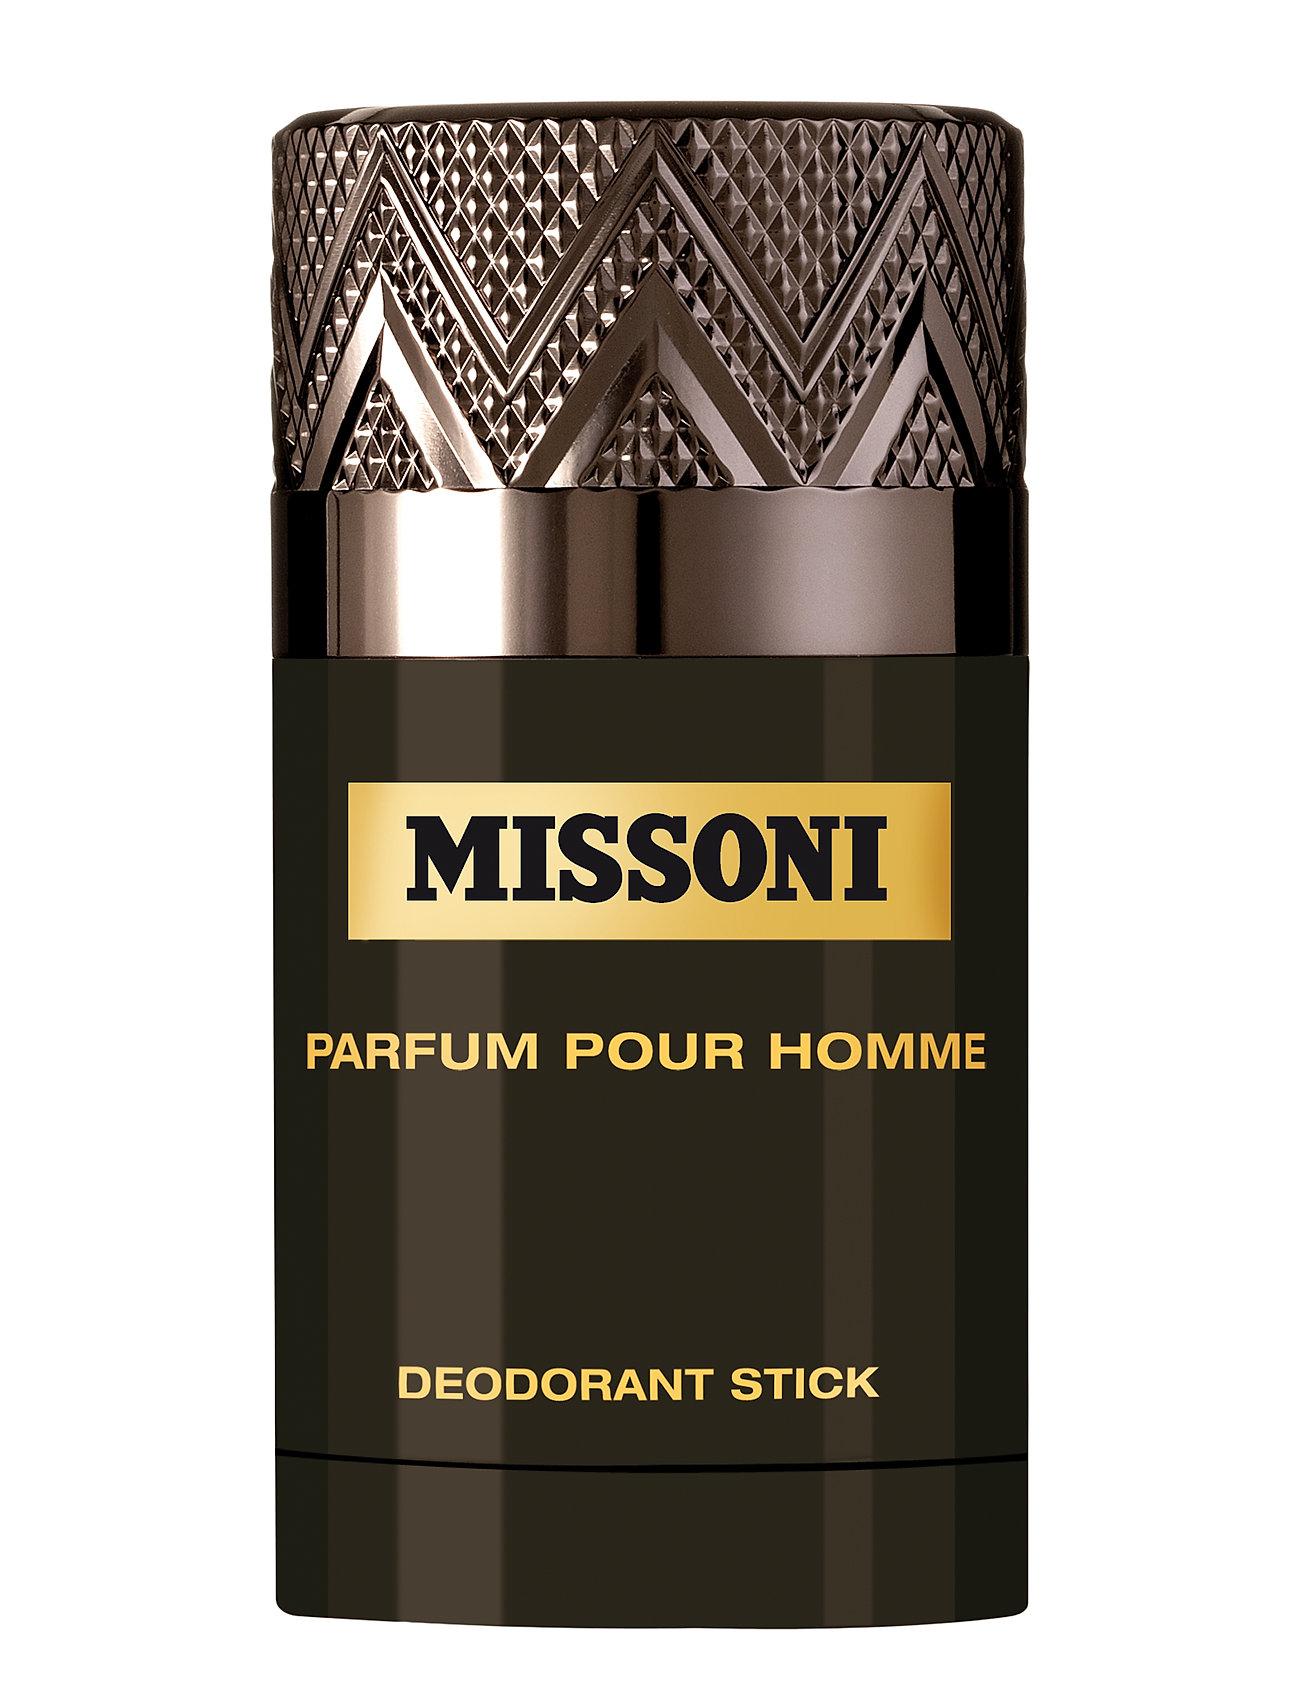 Image of Missoni Homme Deodorant Stick Beauty MEN Deodorants Sticks Nude Missoni Fragrance (3191338739)